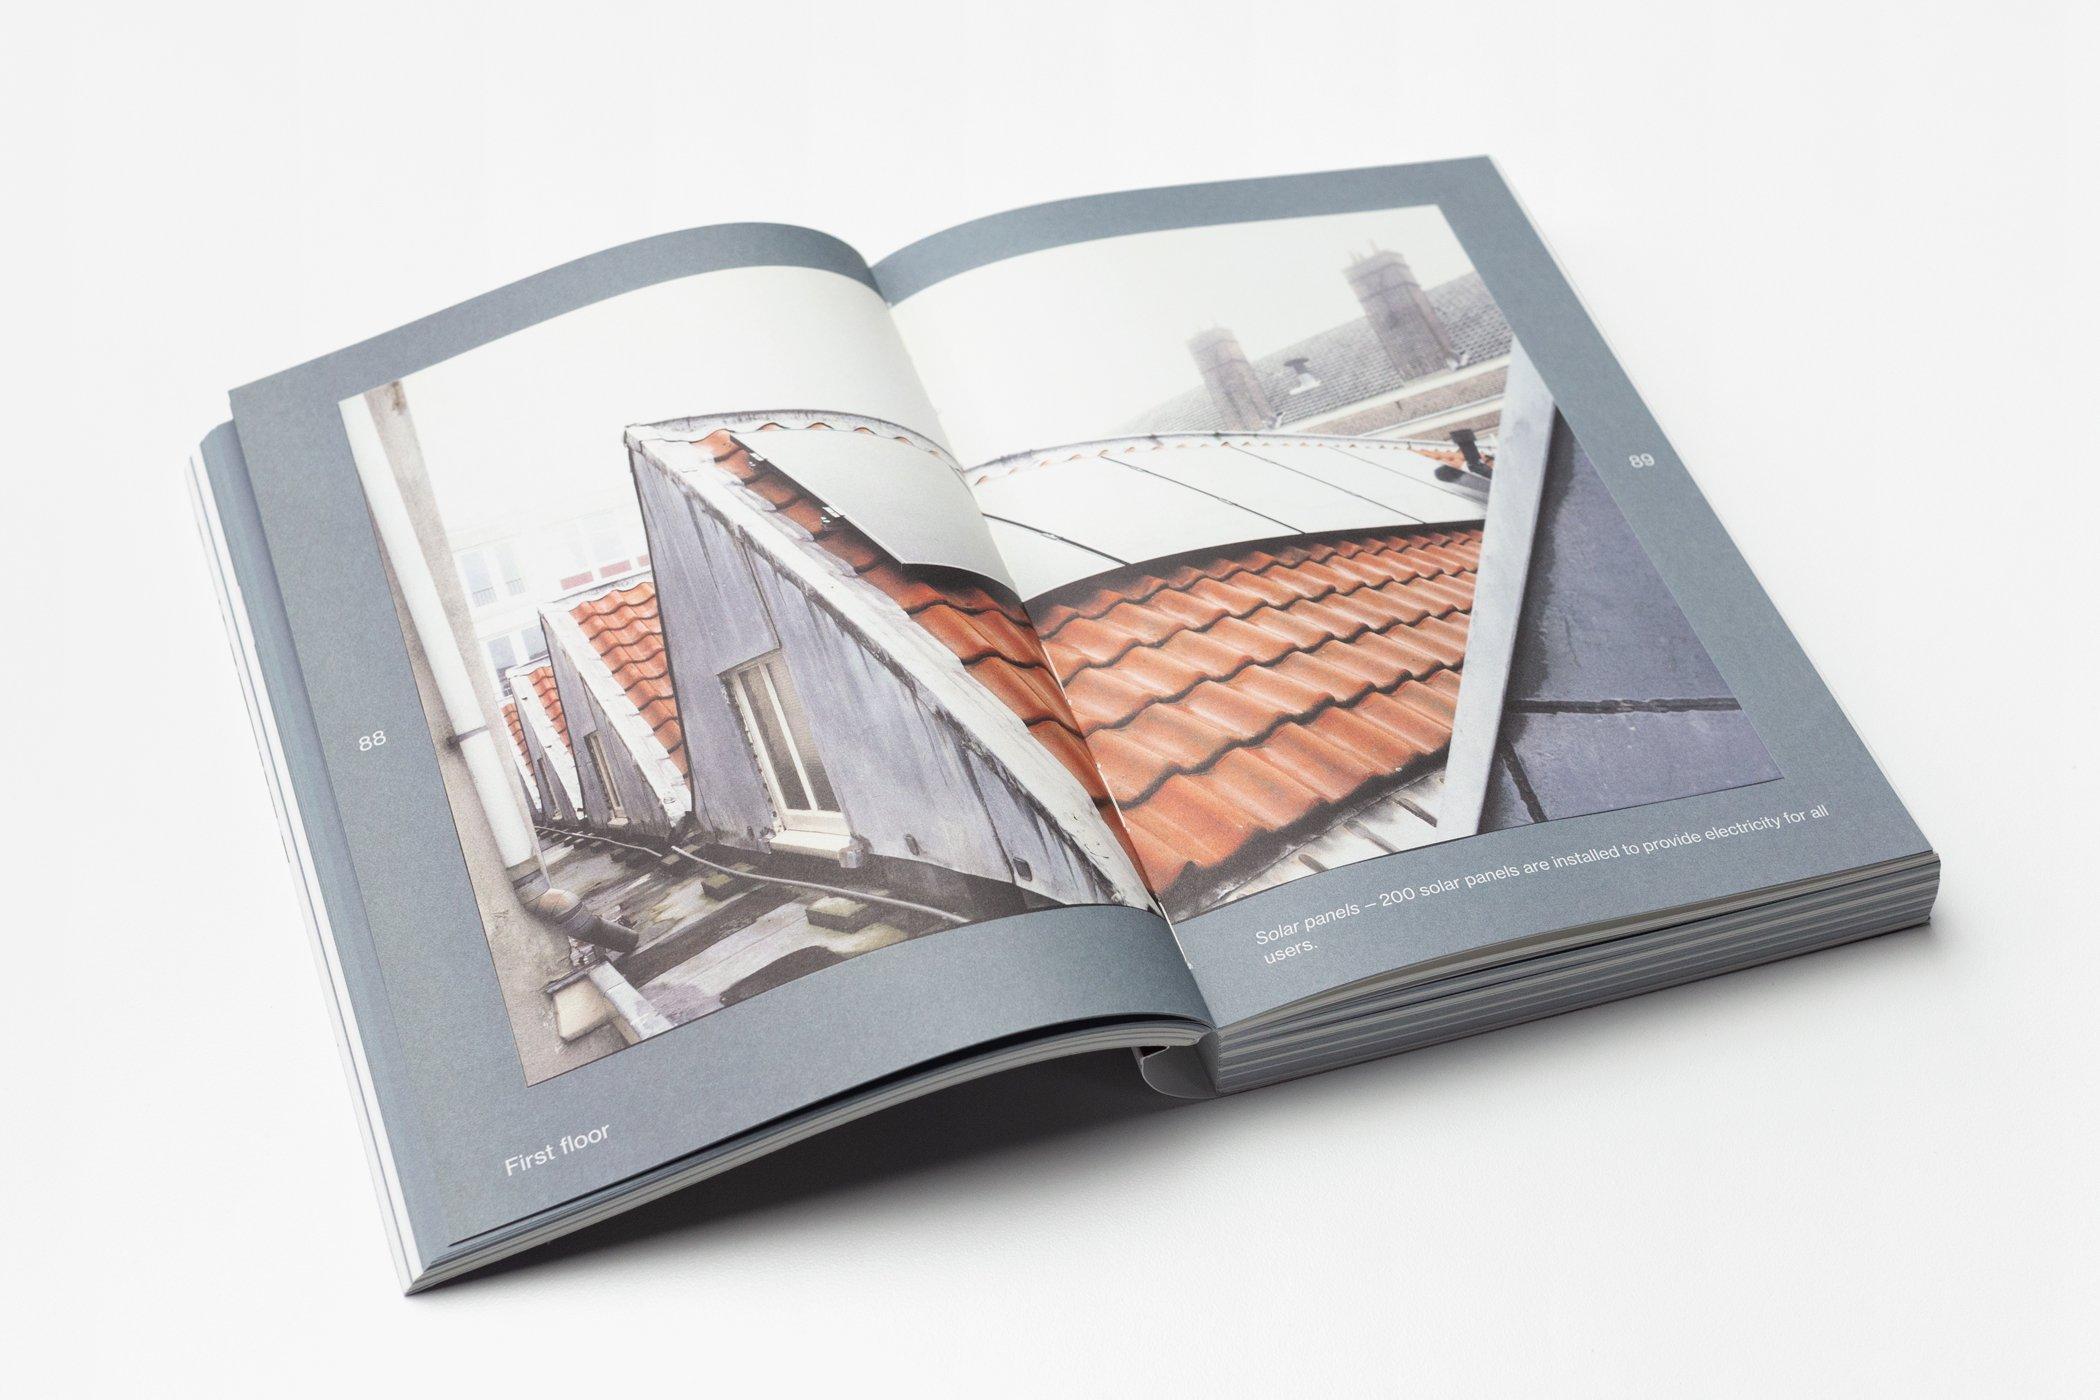 Twee pagina's uit het boek Architecture of Appropriation. On Squatting as spatial practice. Maud Vervenne